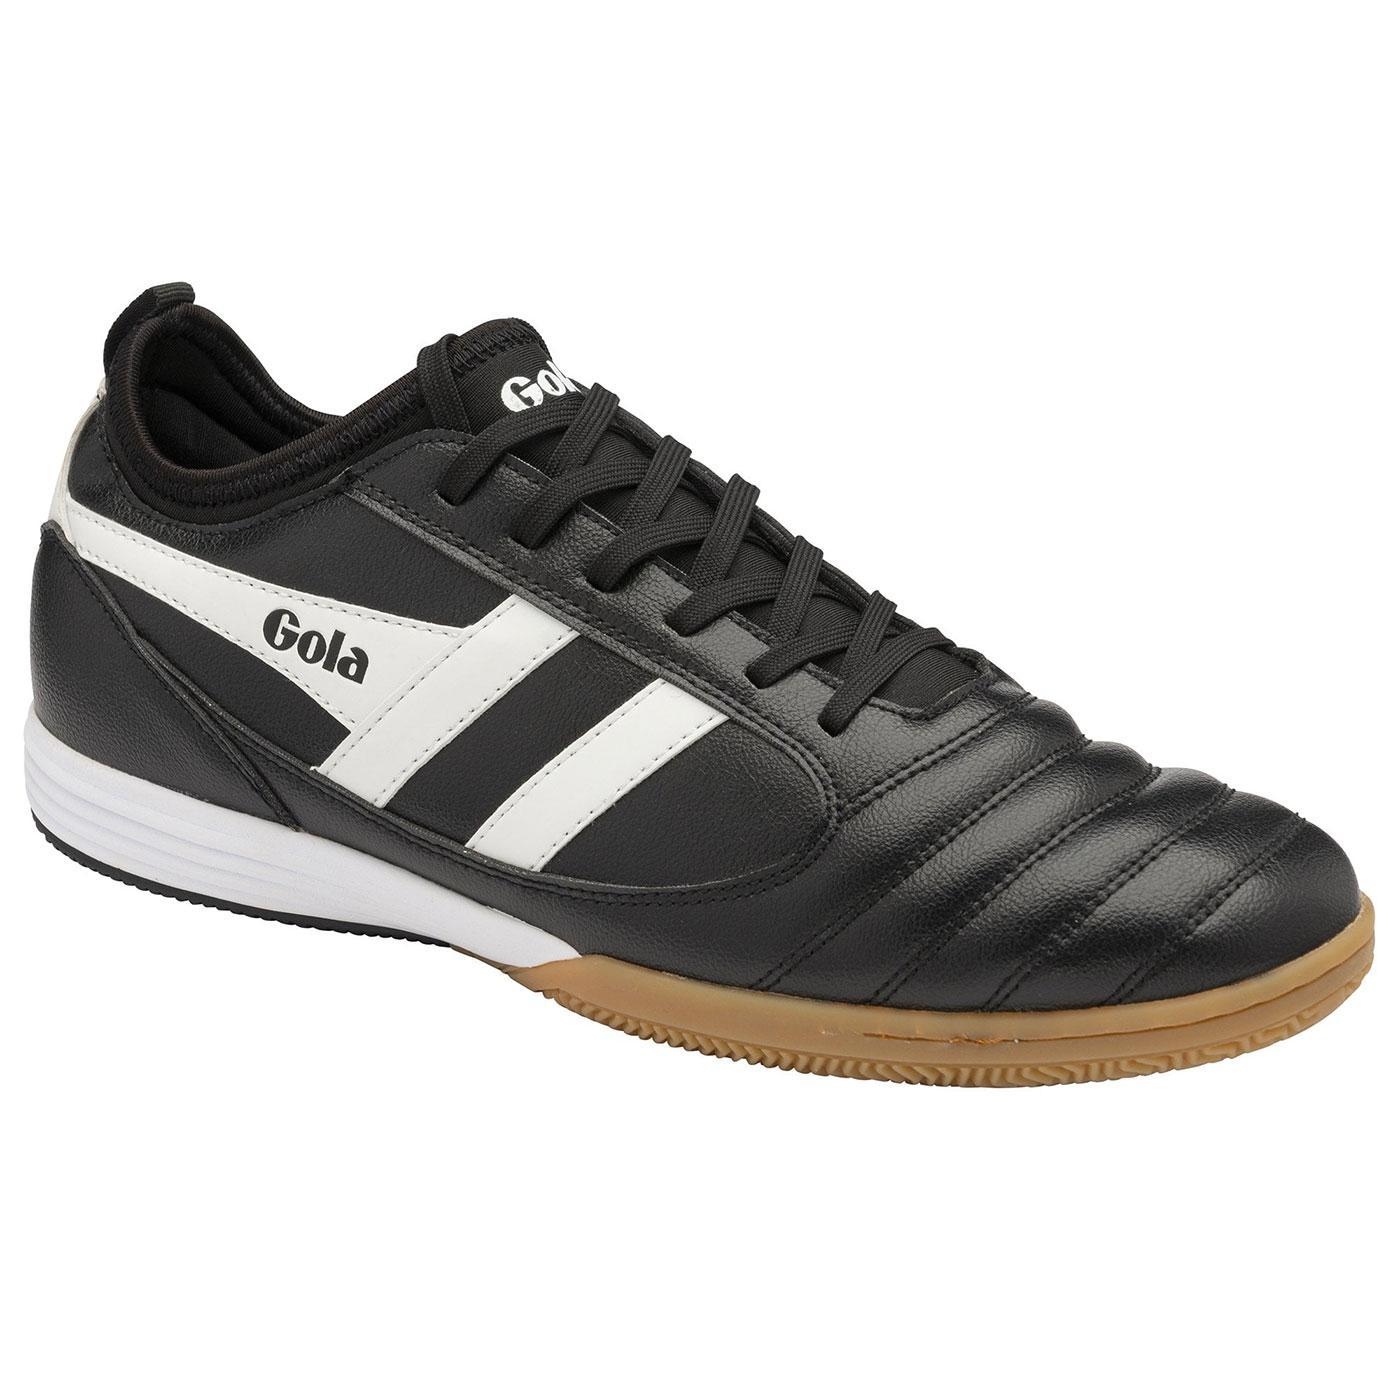 Ceptor TX GOLA Performance Retro Trainers (Black)